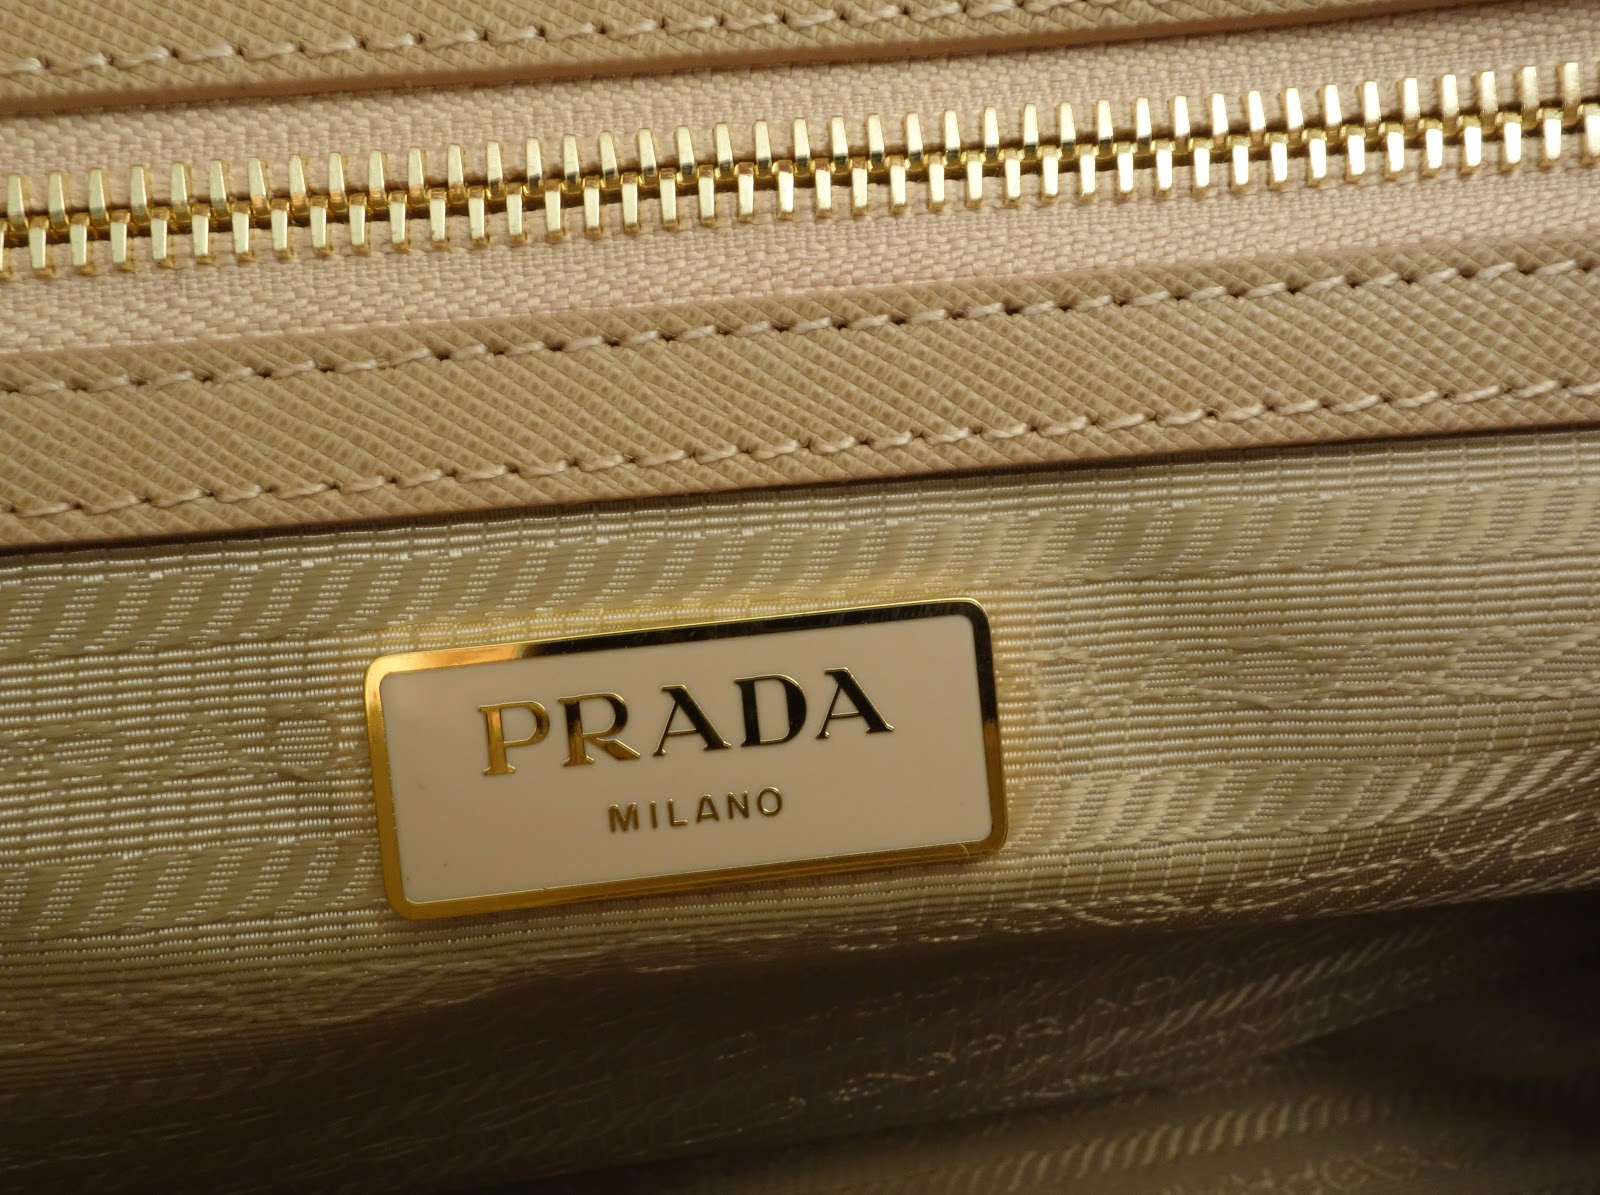 green prada - Purse Princess: Replica Prada Saffiano Tote in Cameo